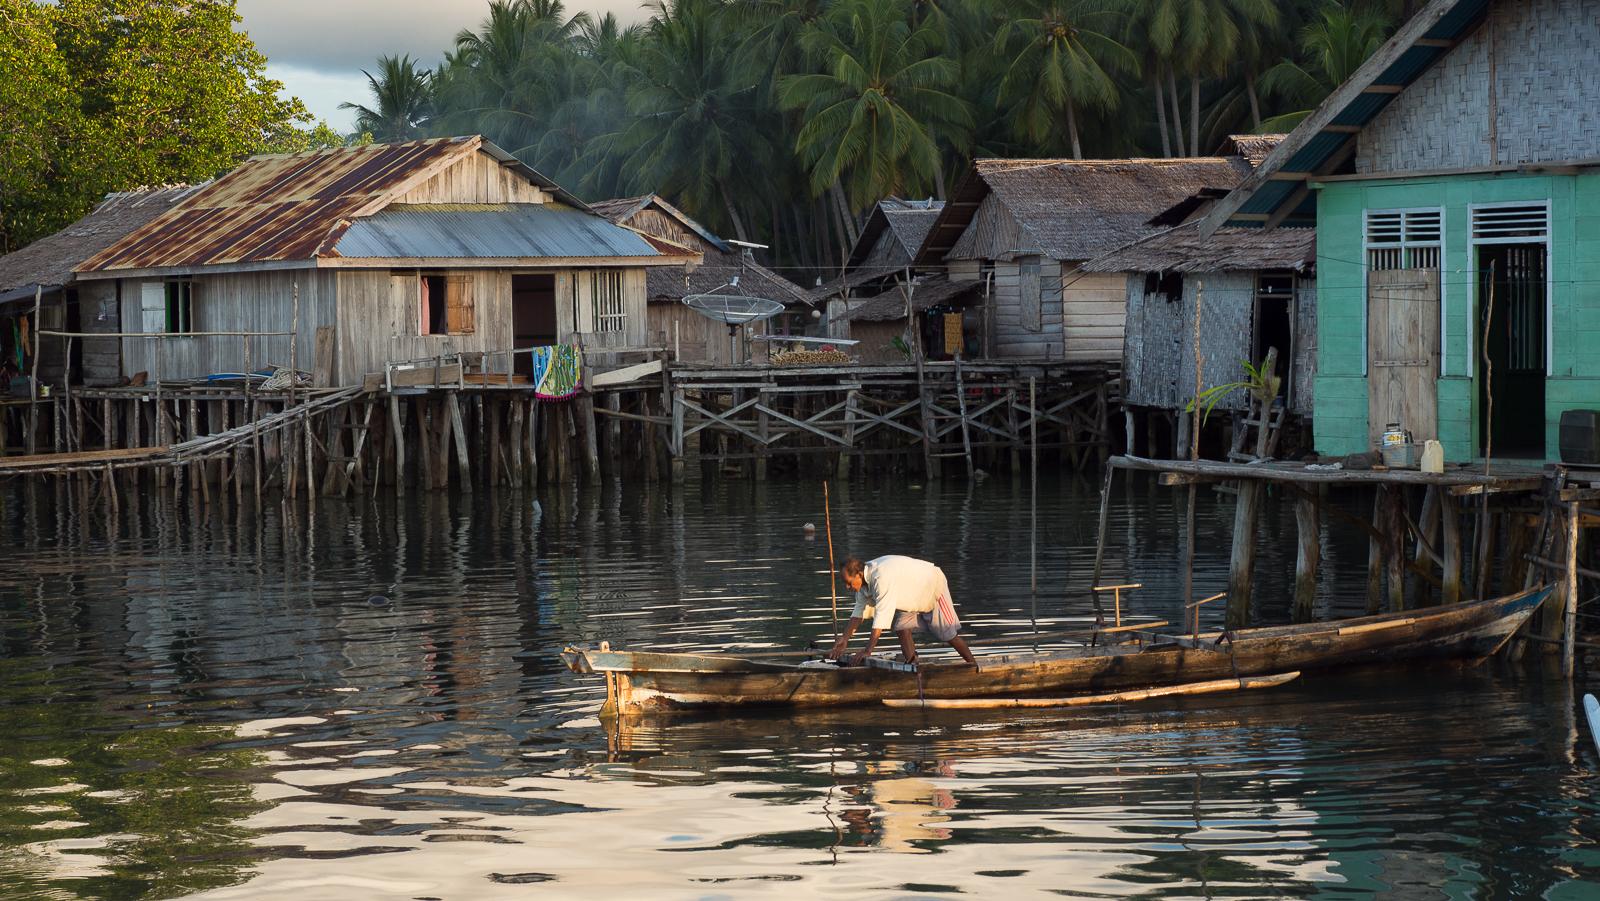 Katupat - The village, Indonesia